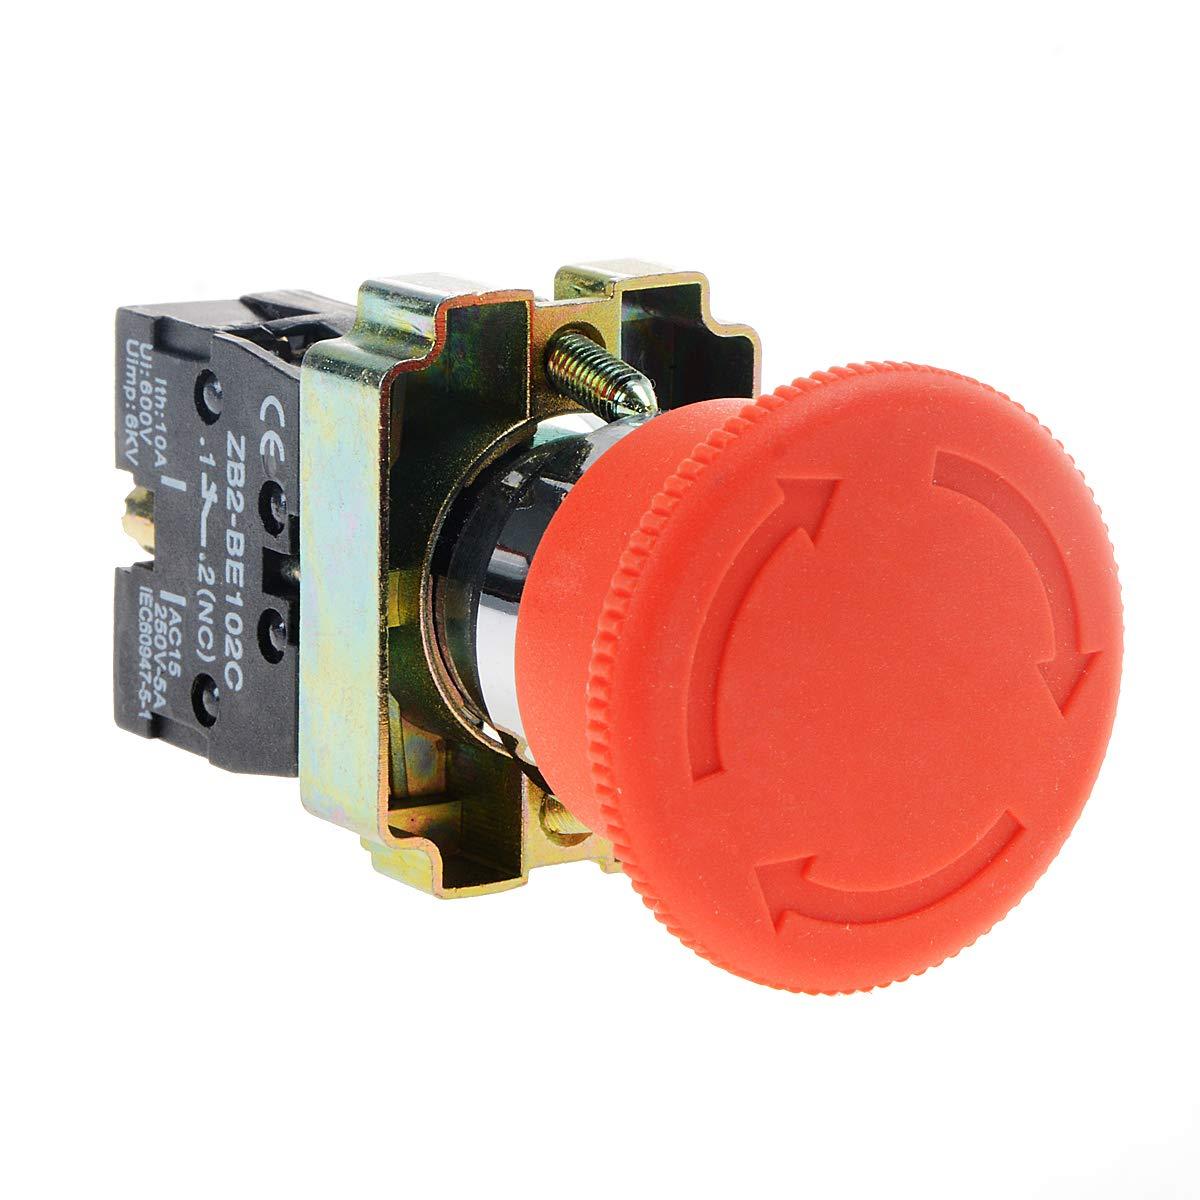 NEW CRAFTSMAN T25 Torx Screwdriver Black//Red Handle 47212